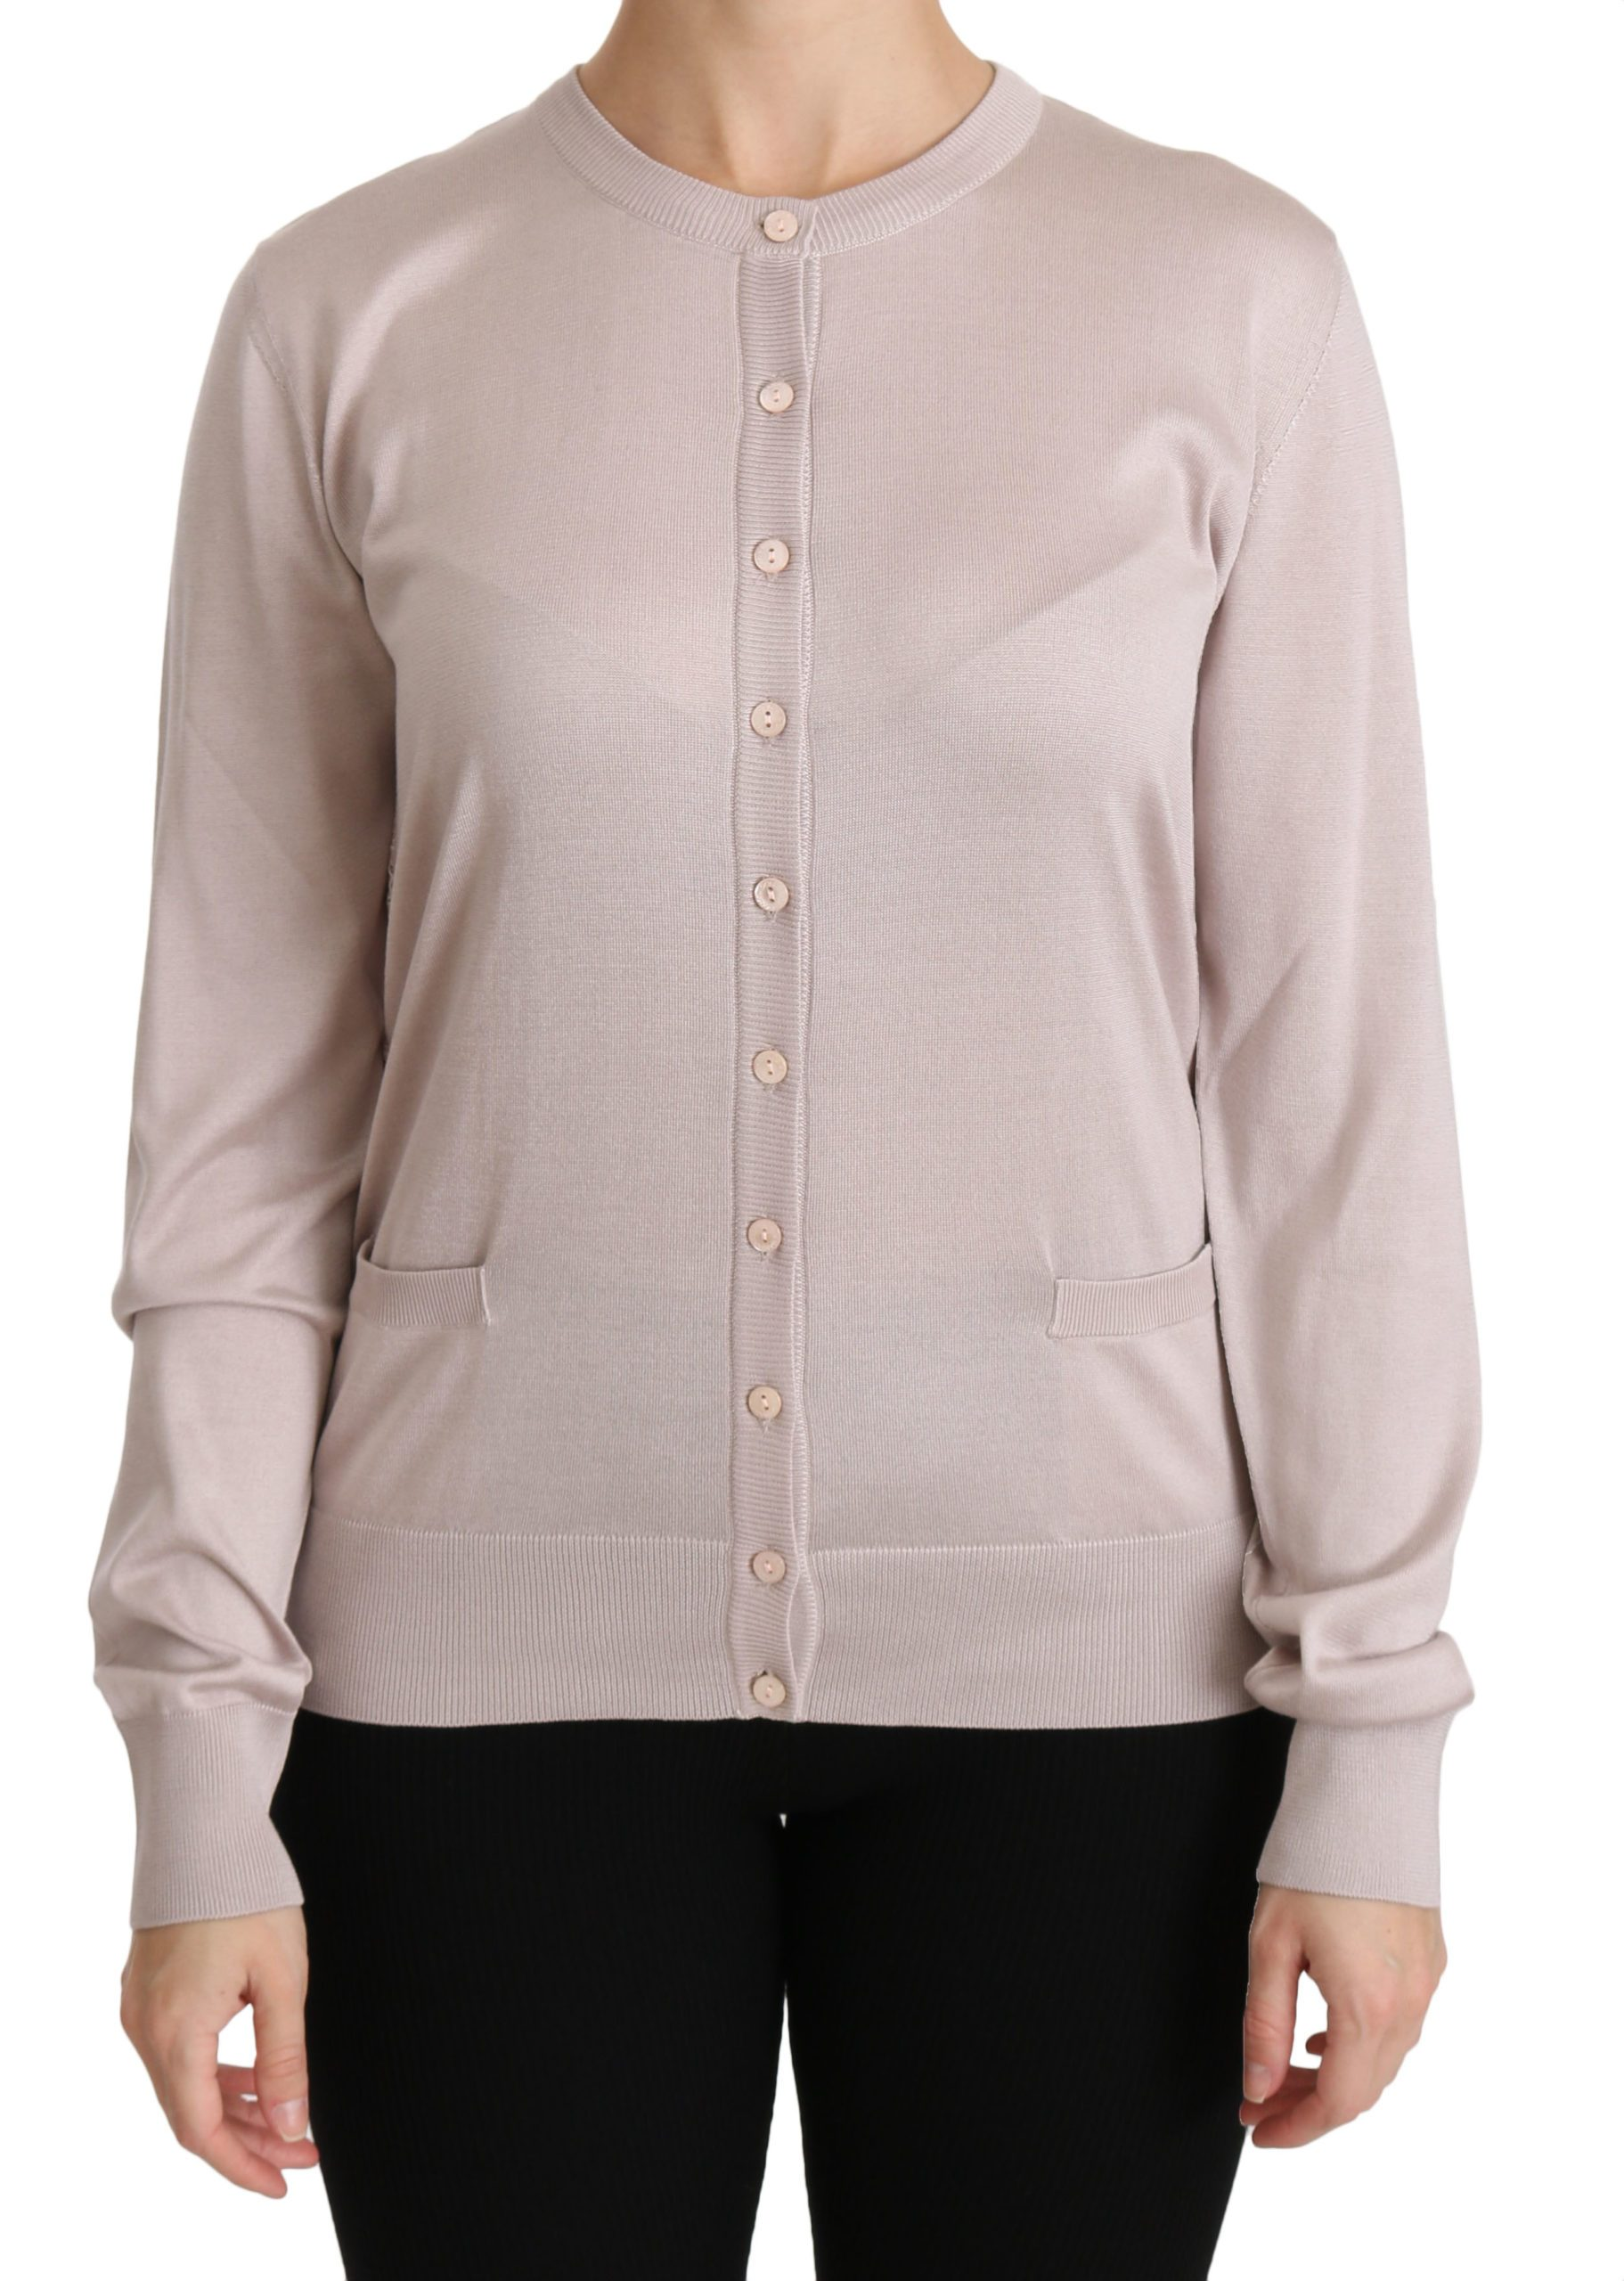 Dolce & Gabbana Women's LS Lace Top Sweater Pink TSH4251 - IT44|L